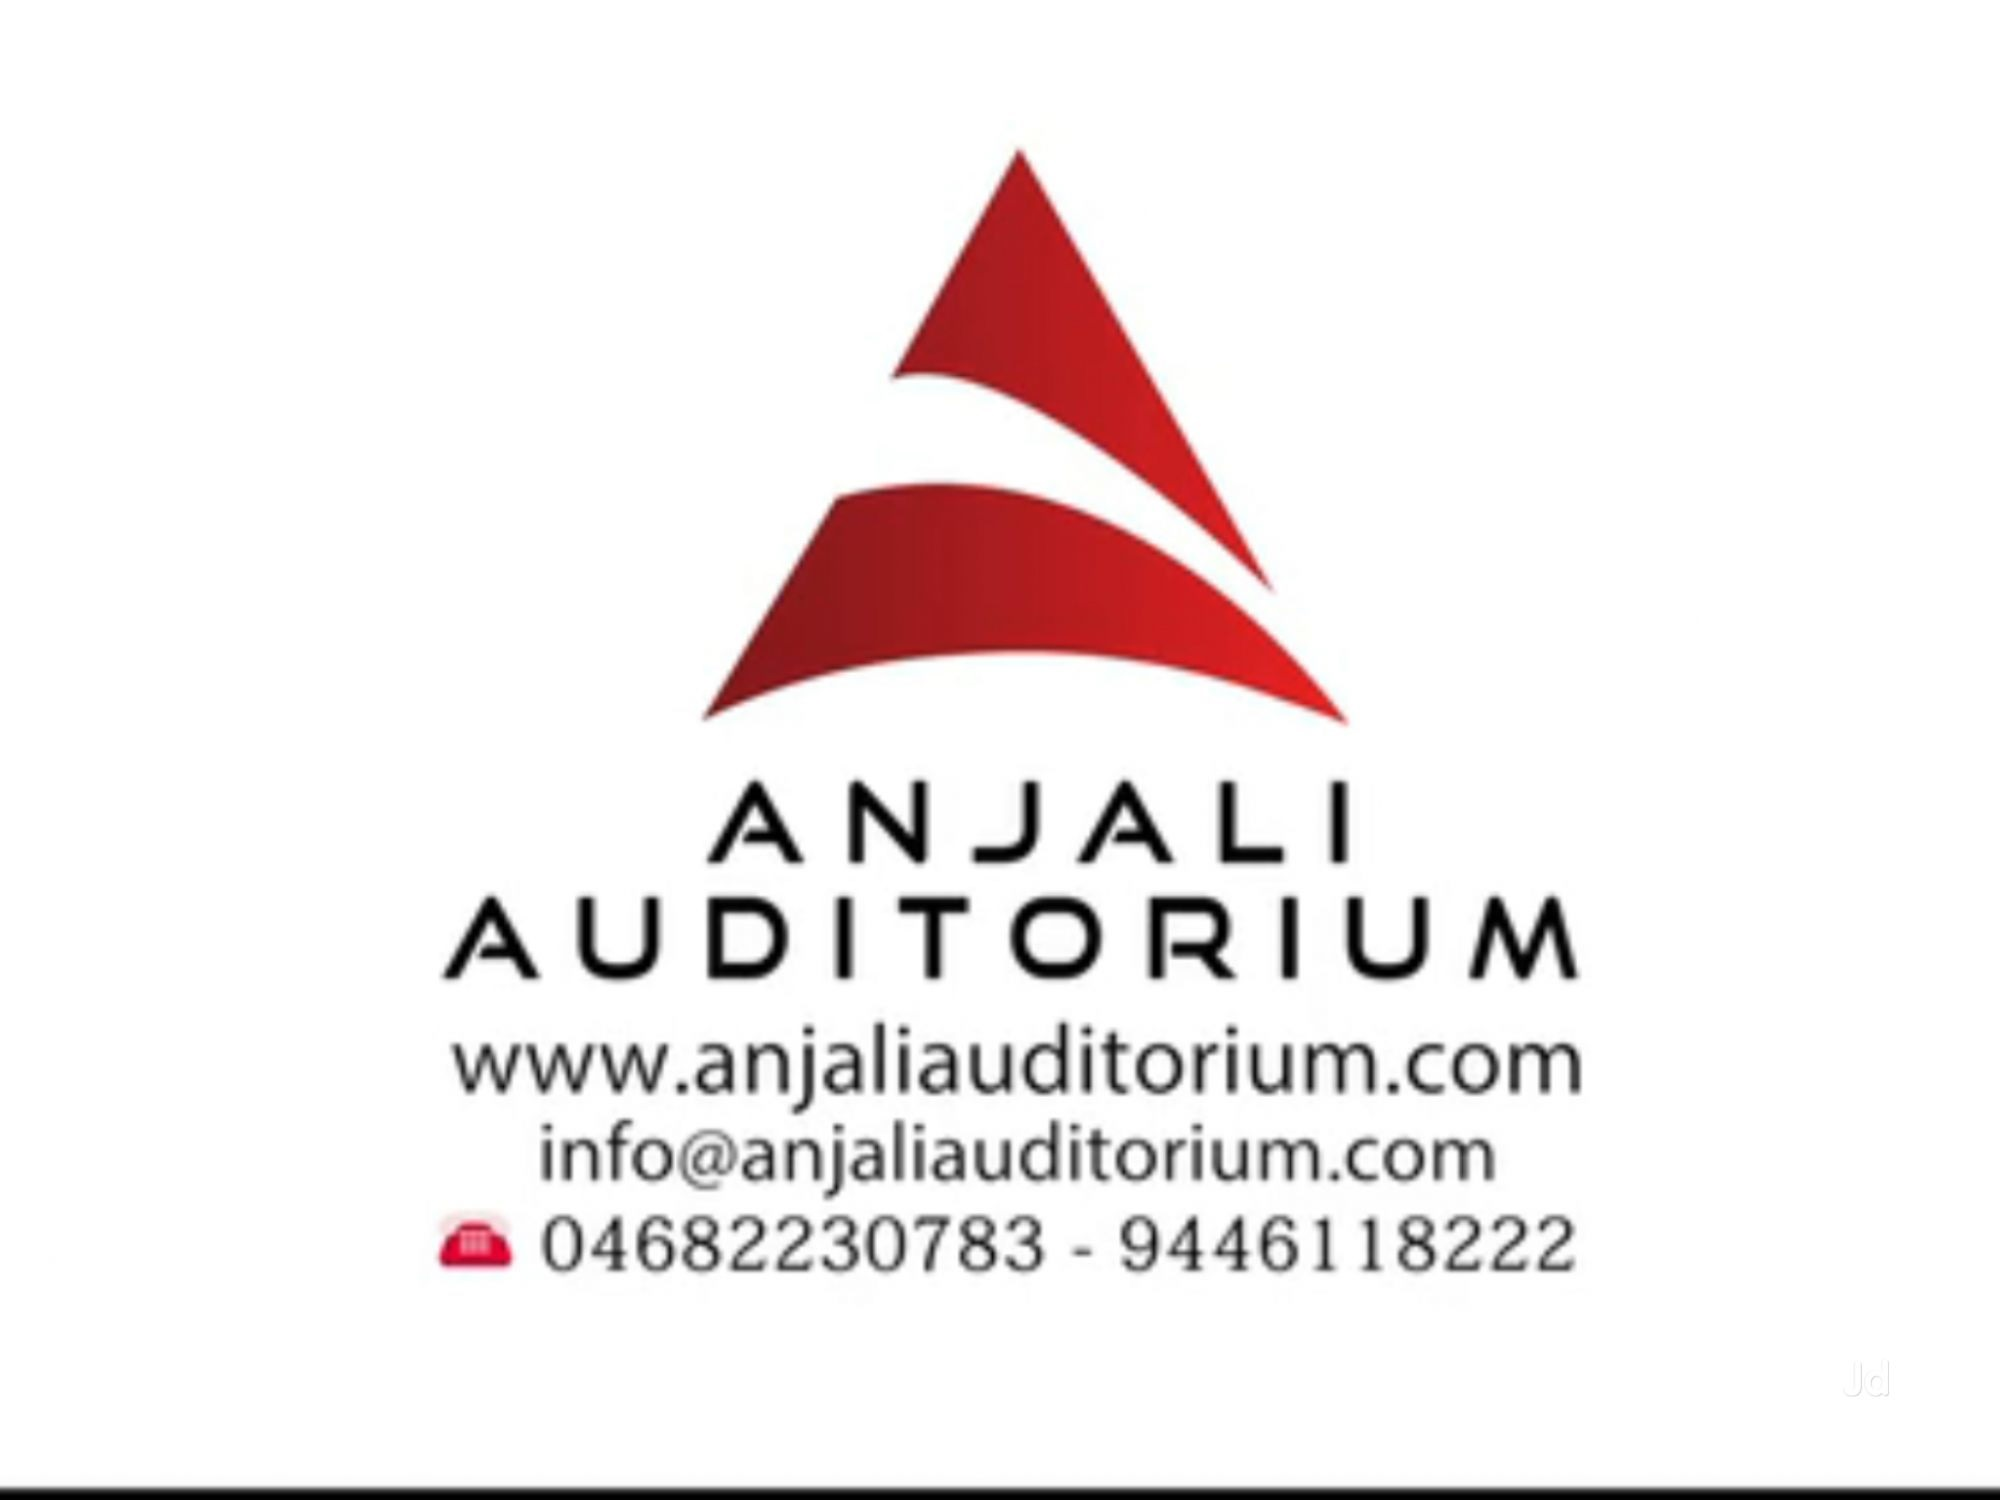 Anjali Auditorium, AUDITORIUM & HALLS,  service in Omalloor, Pathanamthitta